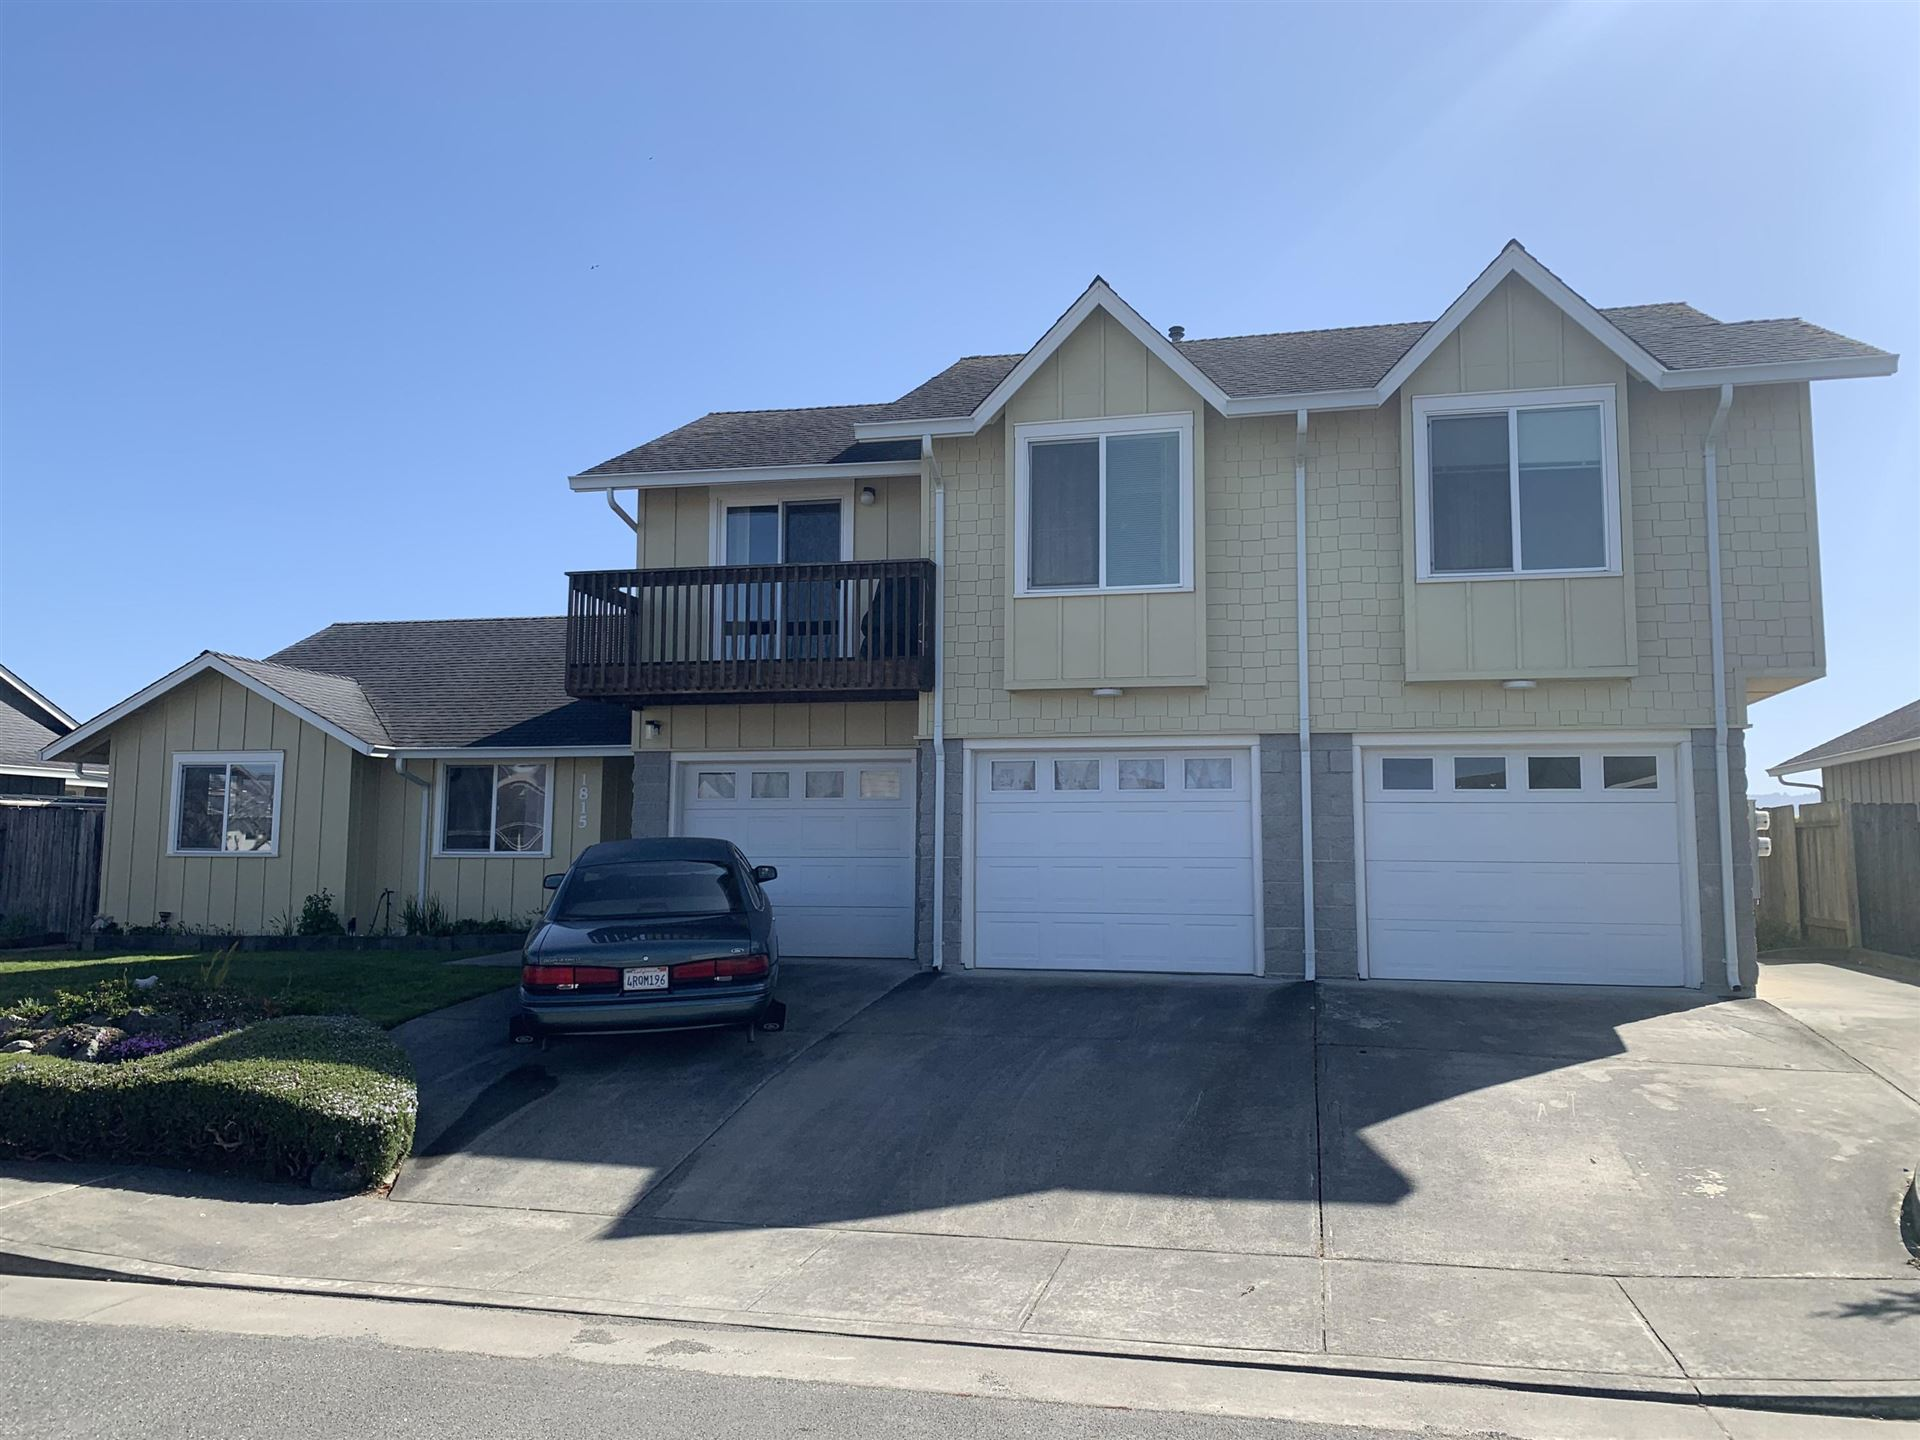 1815 Chanterelle Drive, McKinleyville, CA 95519 - MLS#: 258673